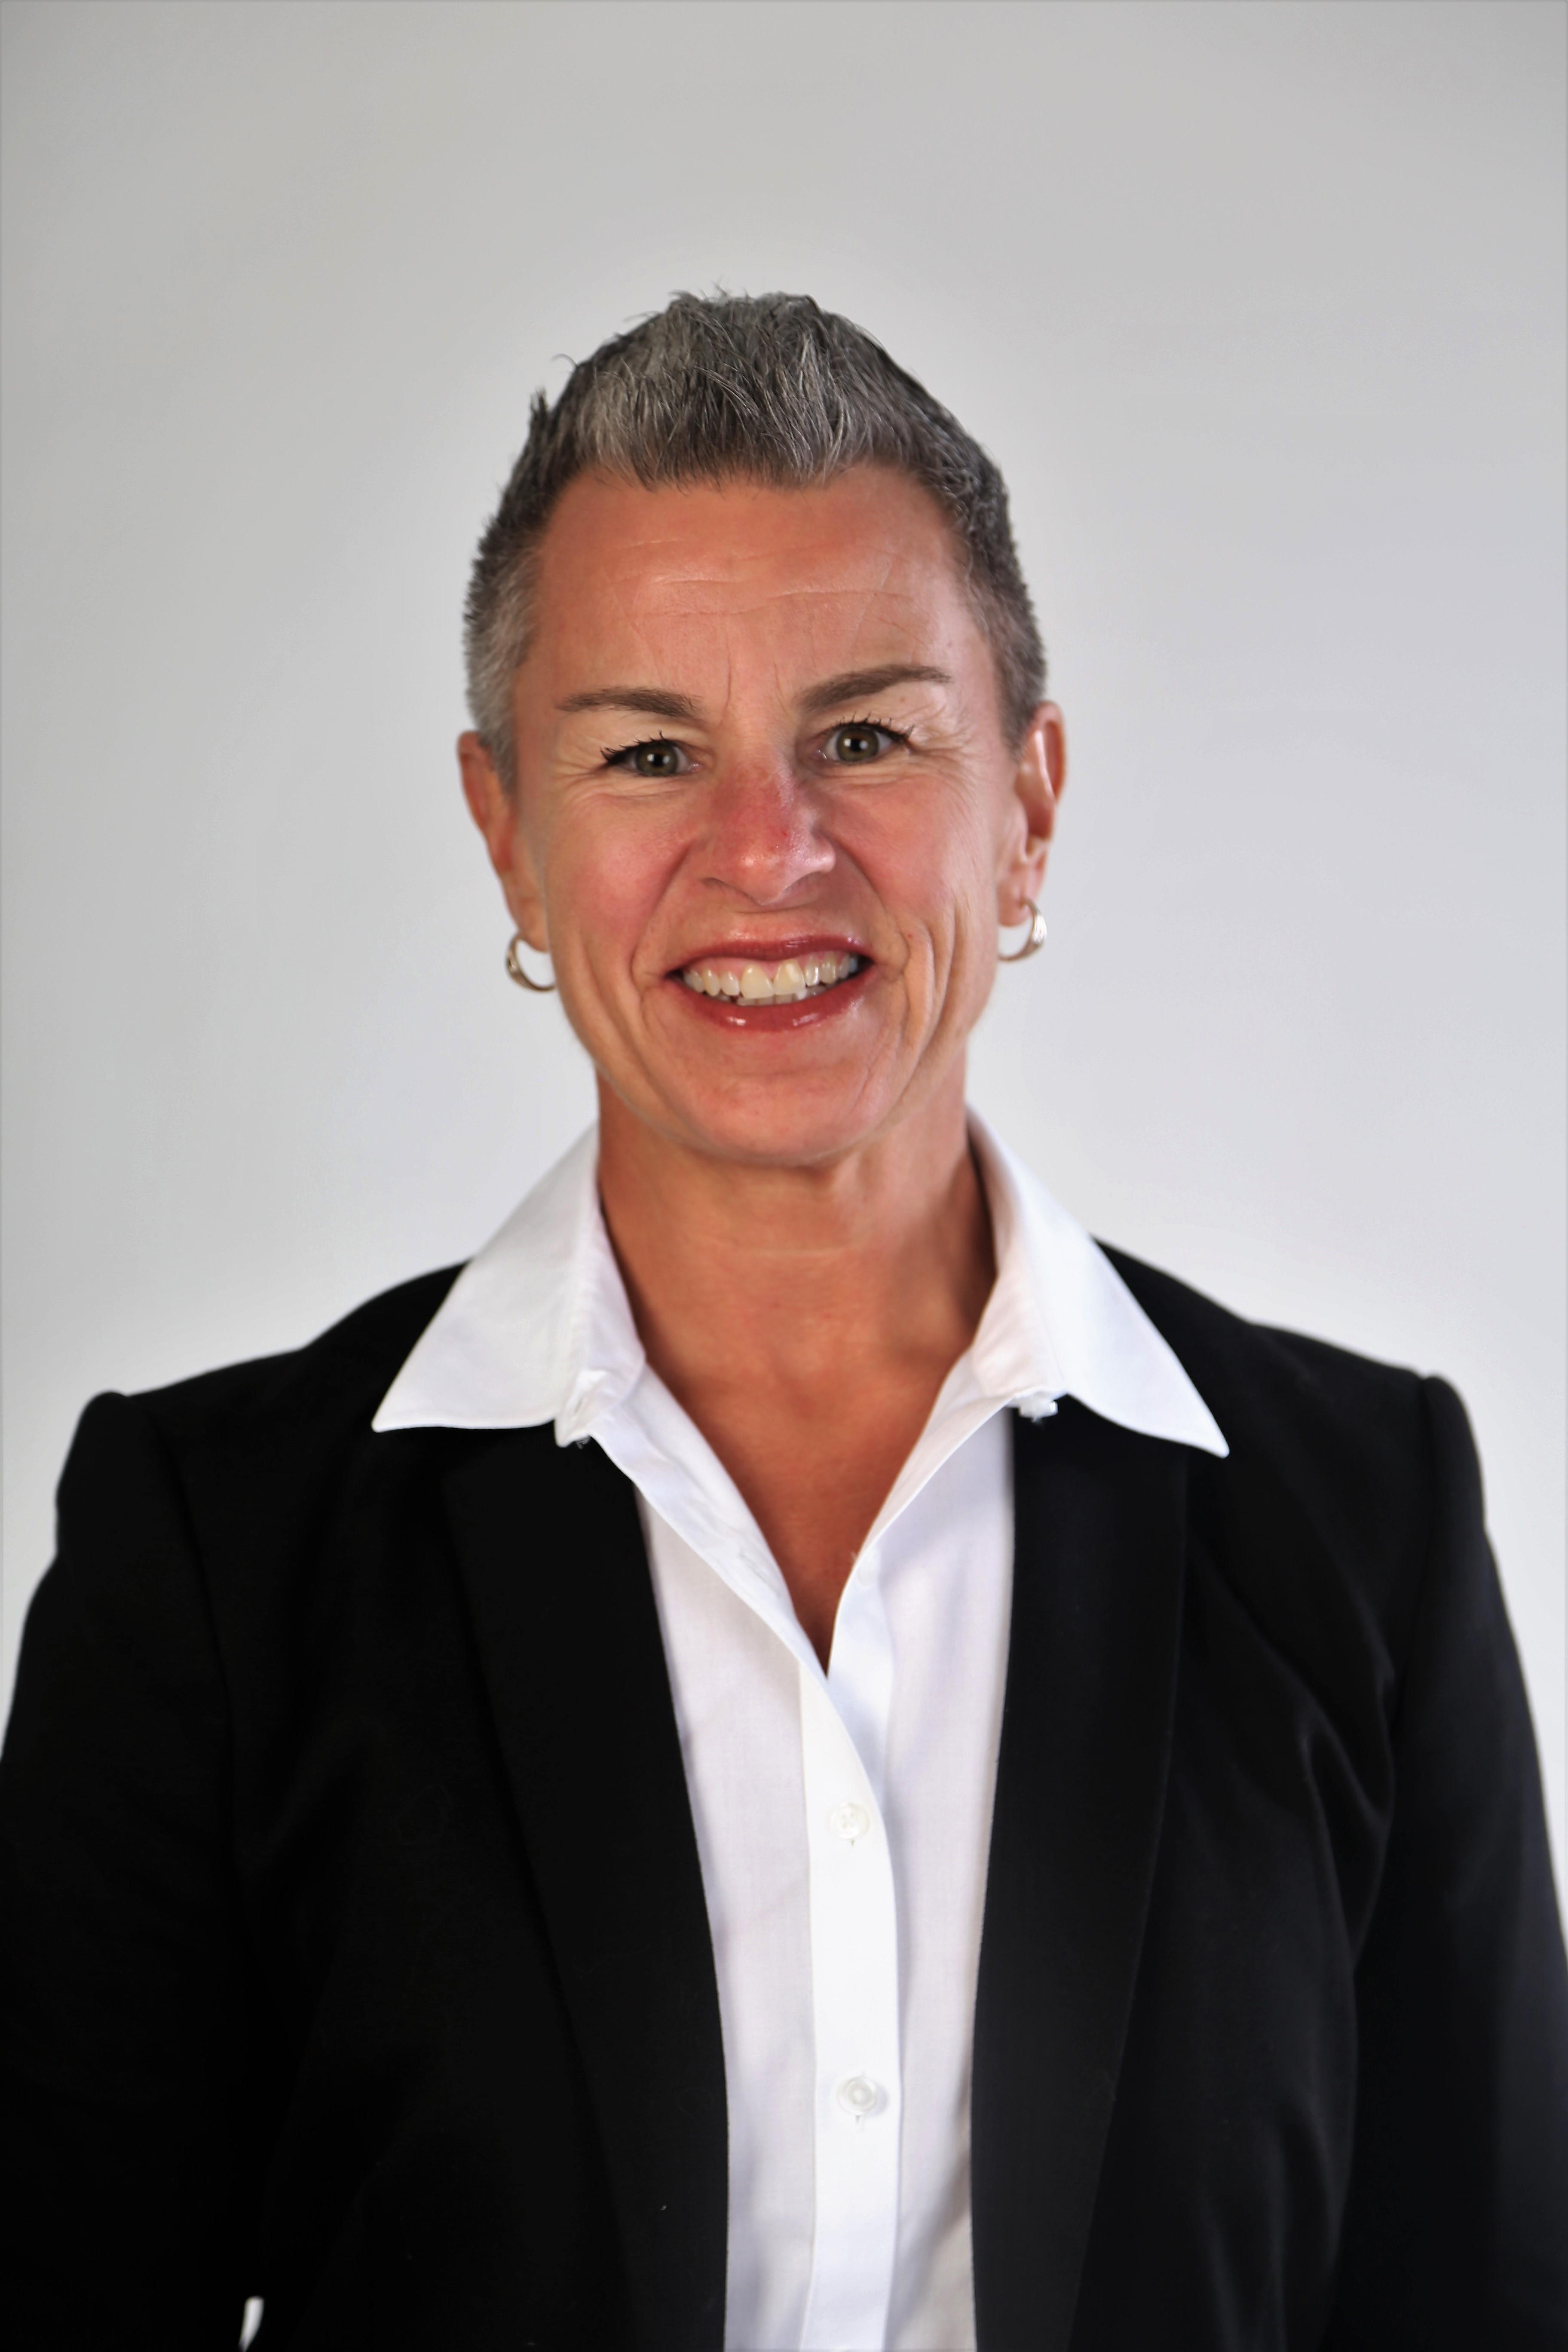 Colleen DeVeyrac MLI, BED, BPE